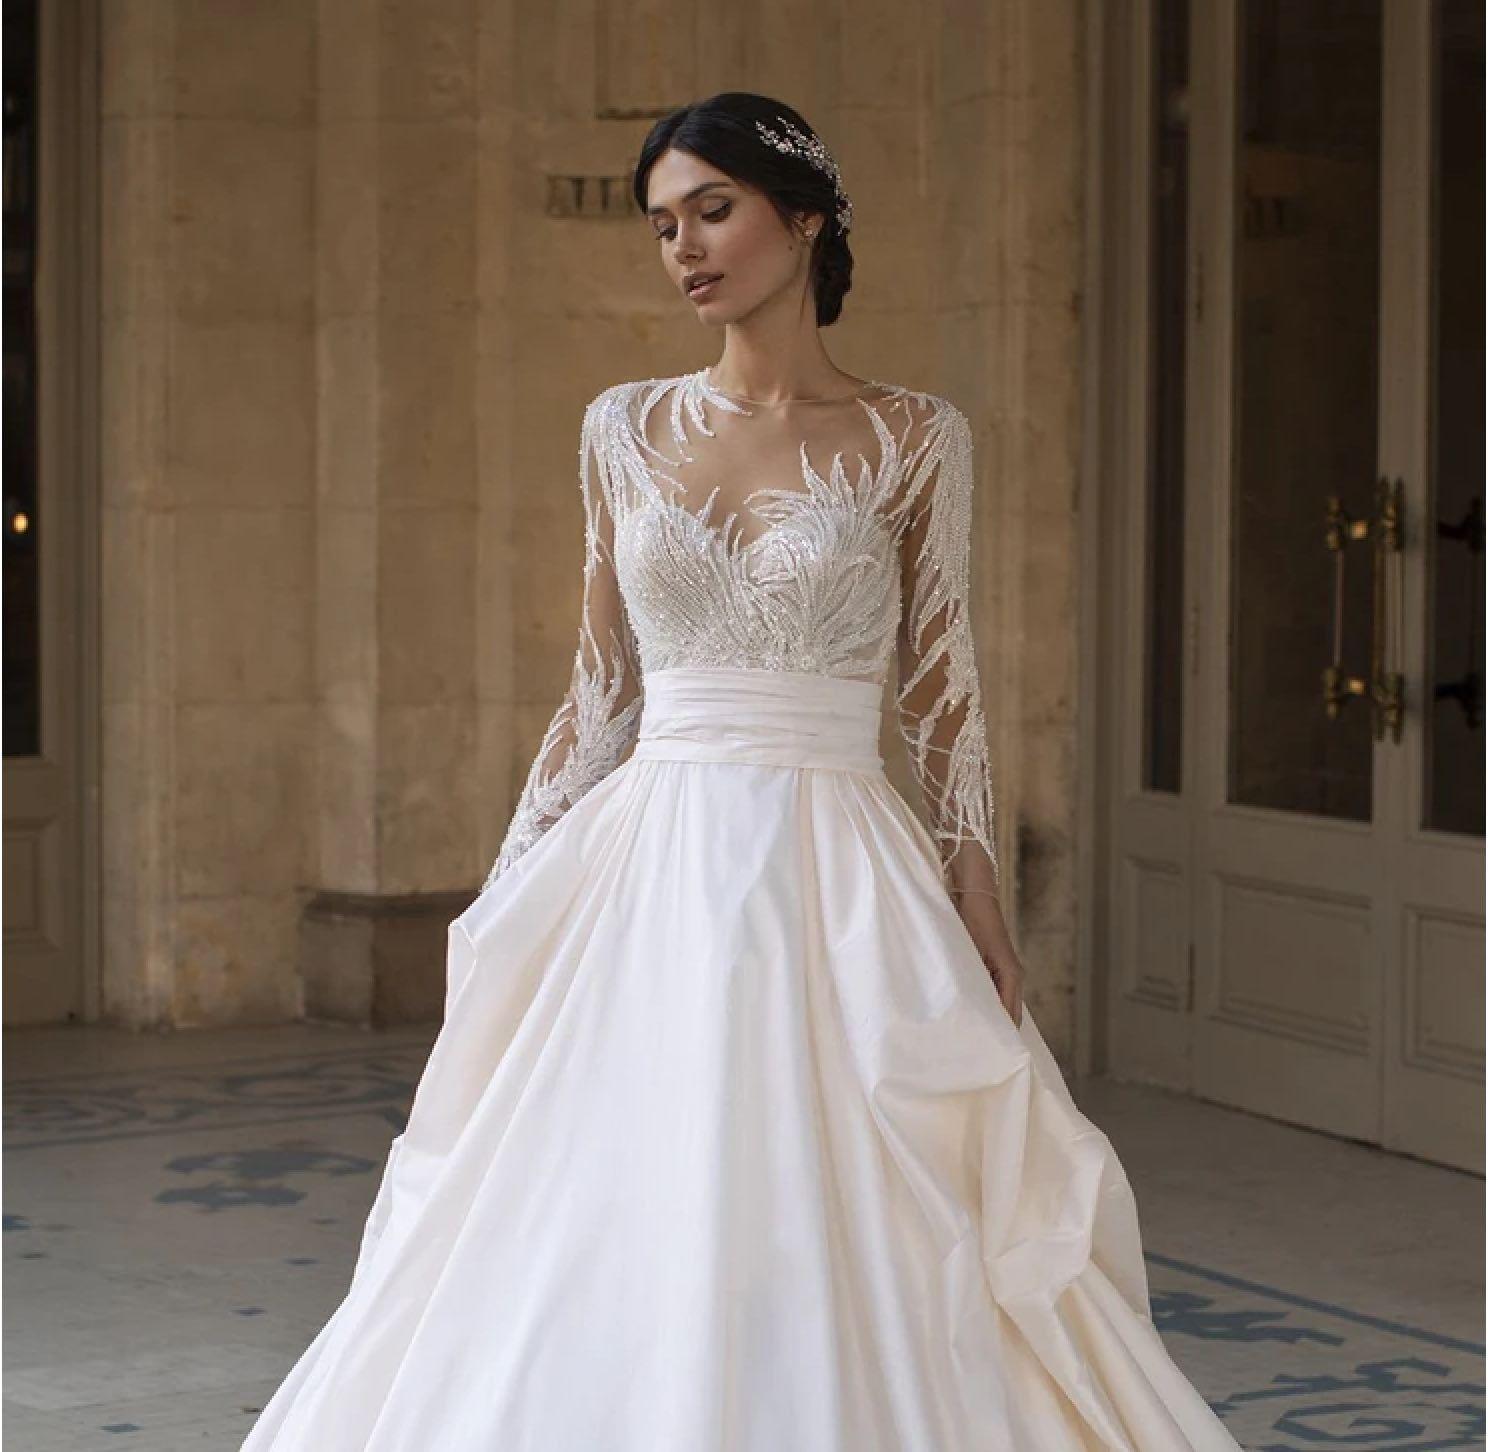 Model wearing a white Maggie Sottero dress